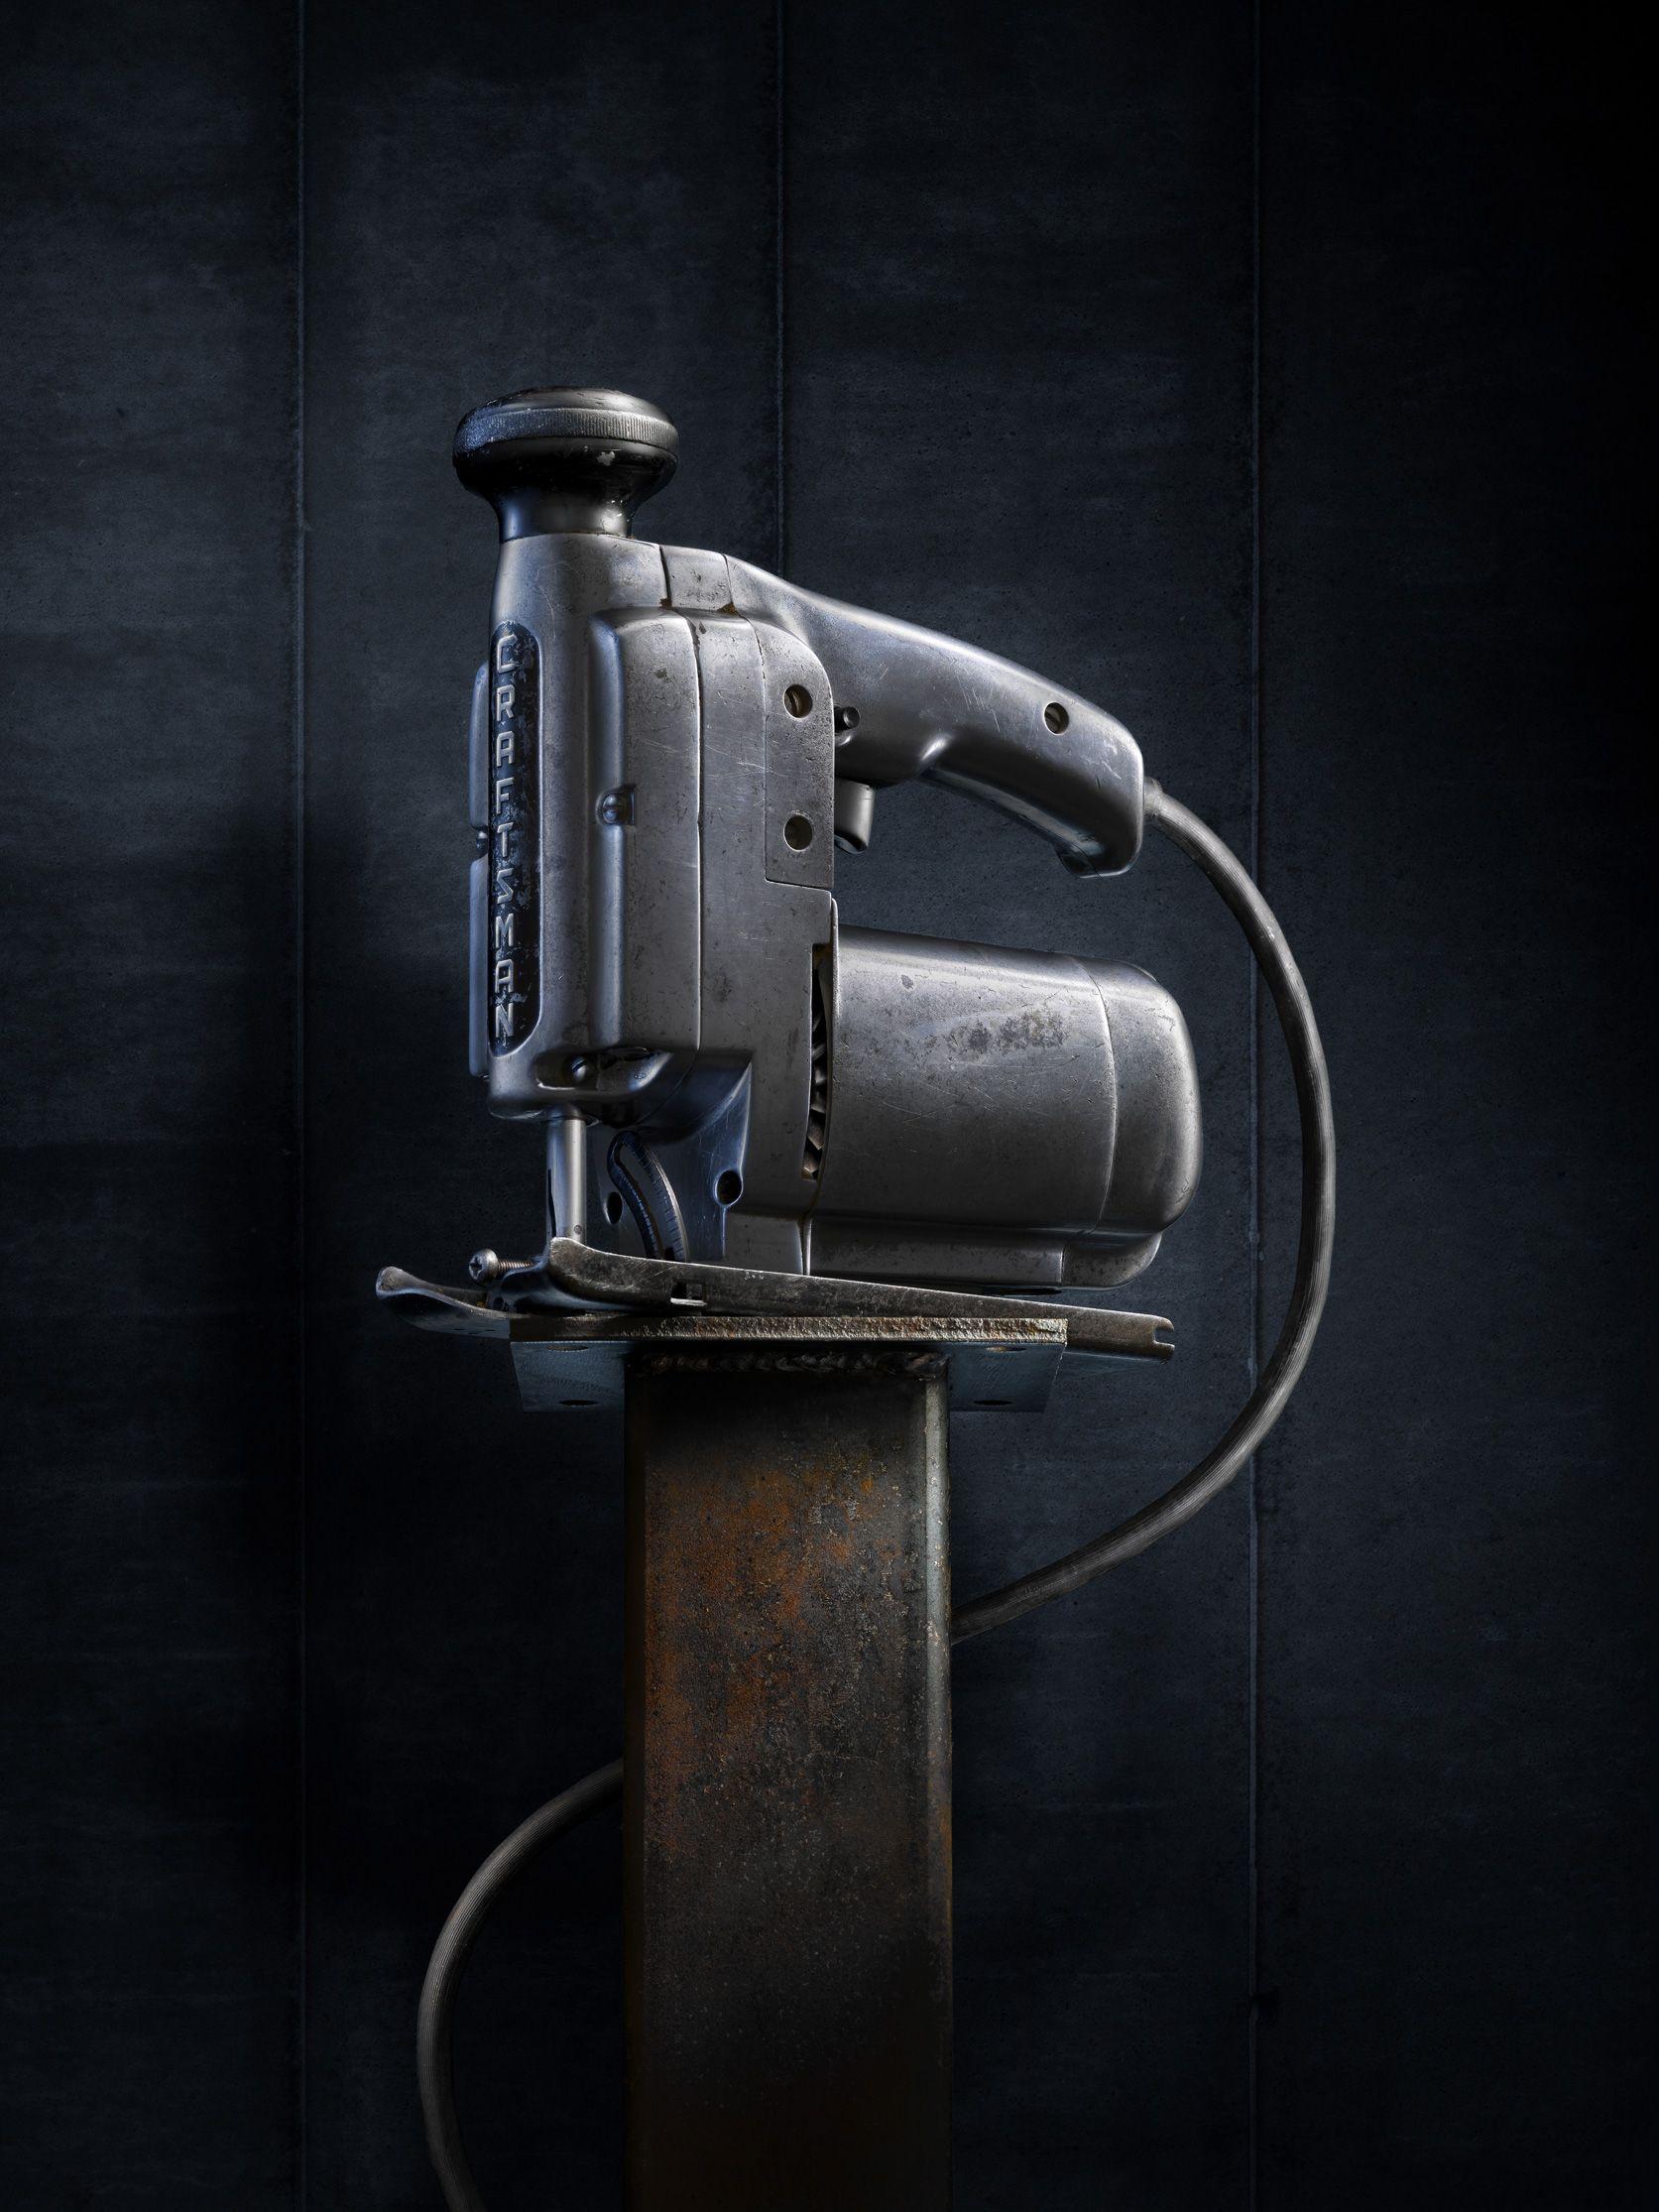 Craftsman Sabre Saw by Harold Ross